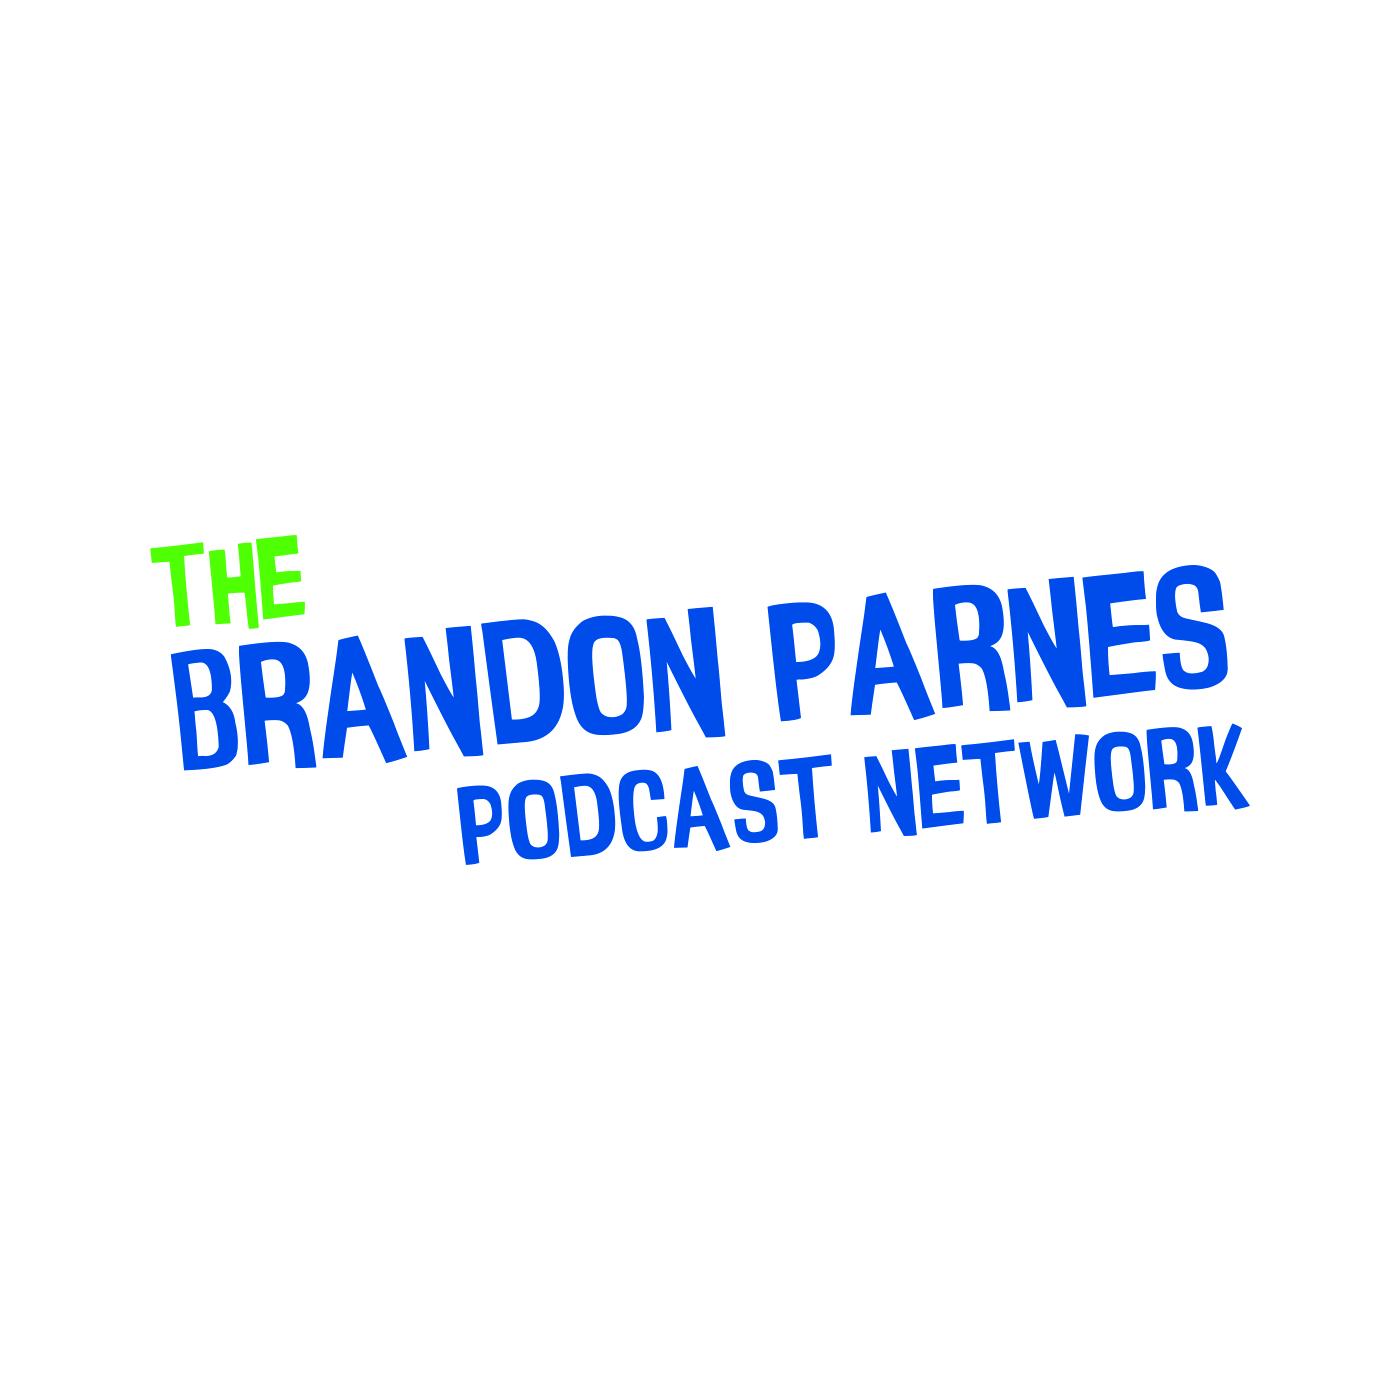 The Brandon Parnes Podcast Network